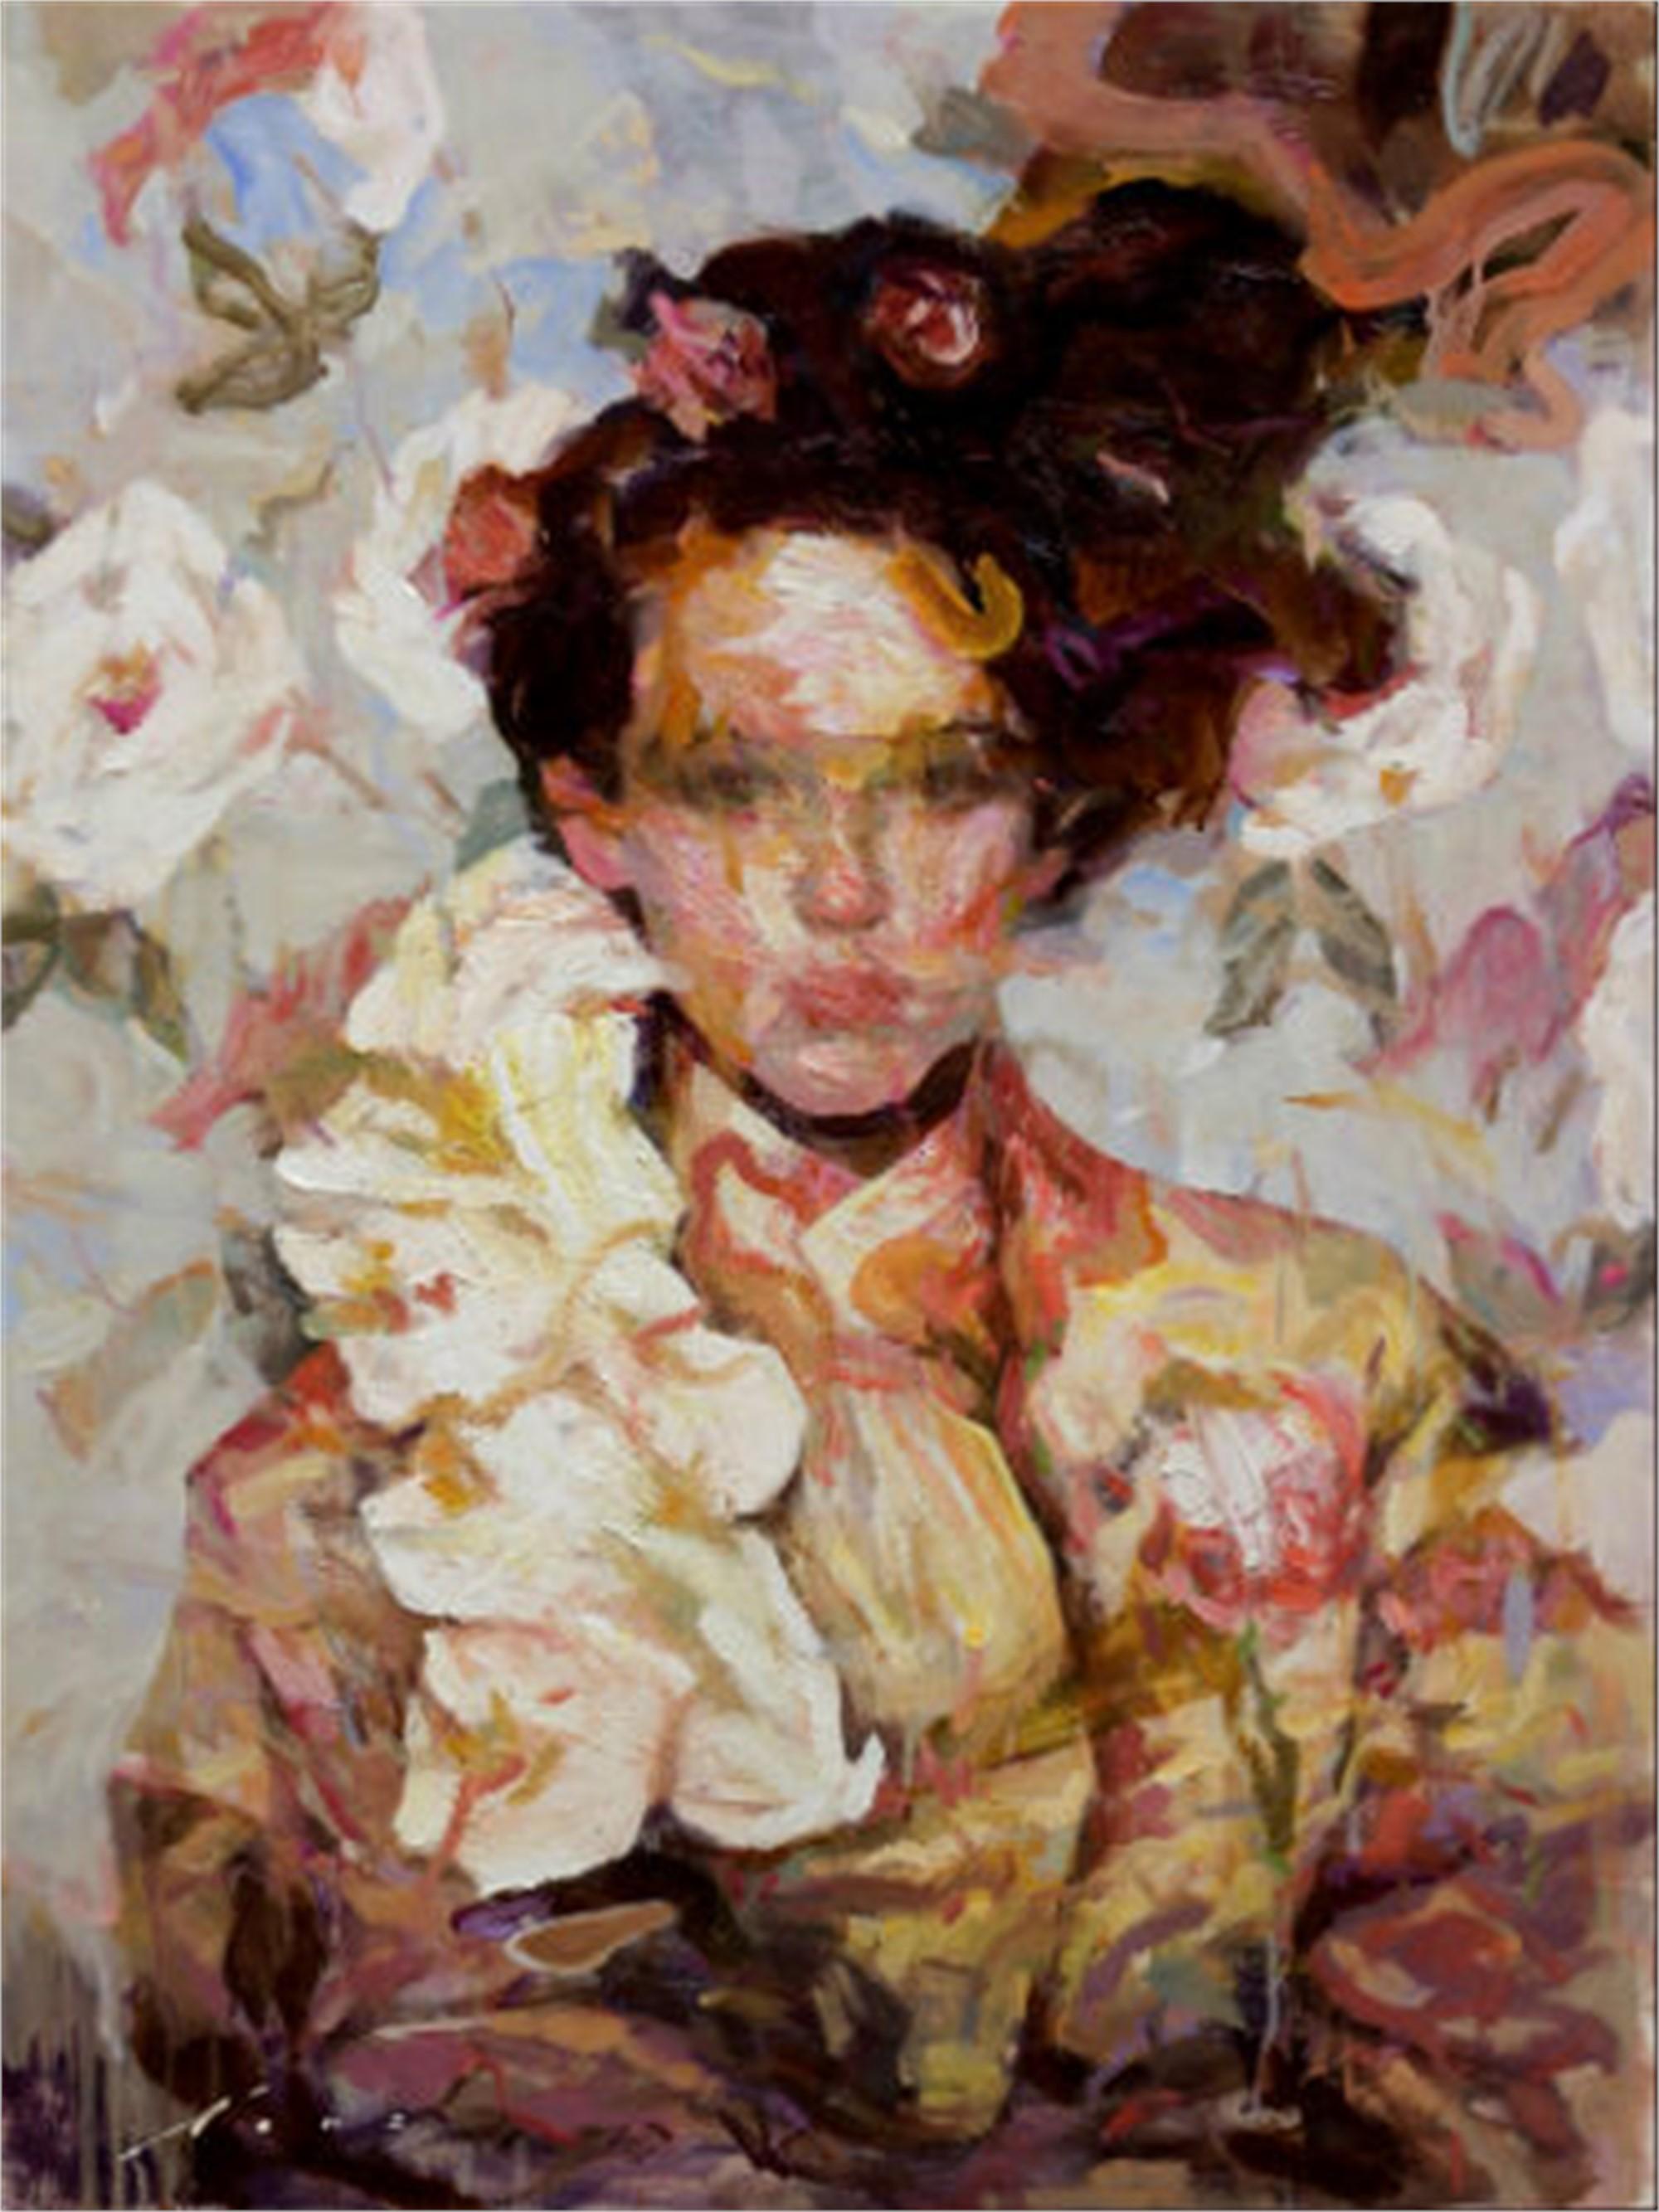 1985 by Vincent Xeus